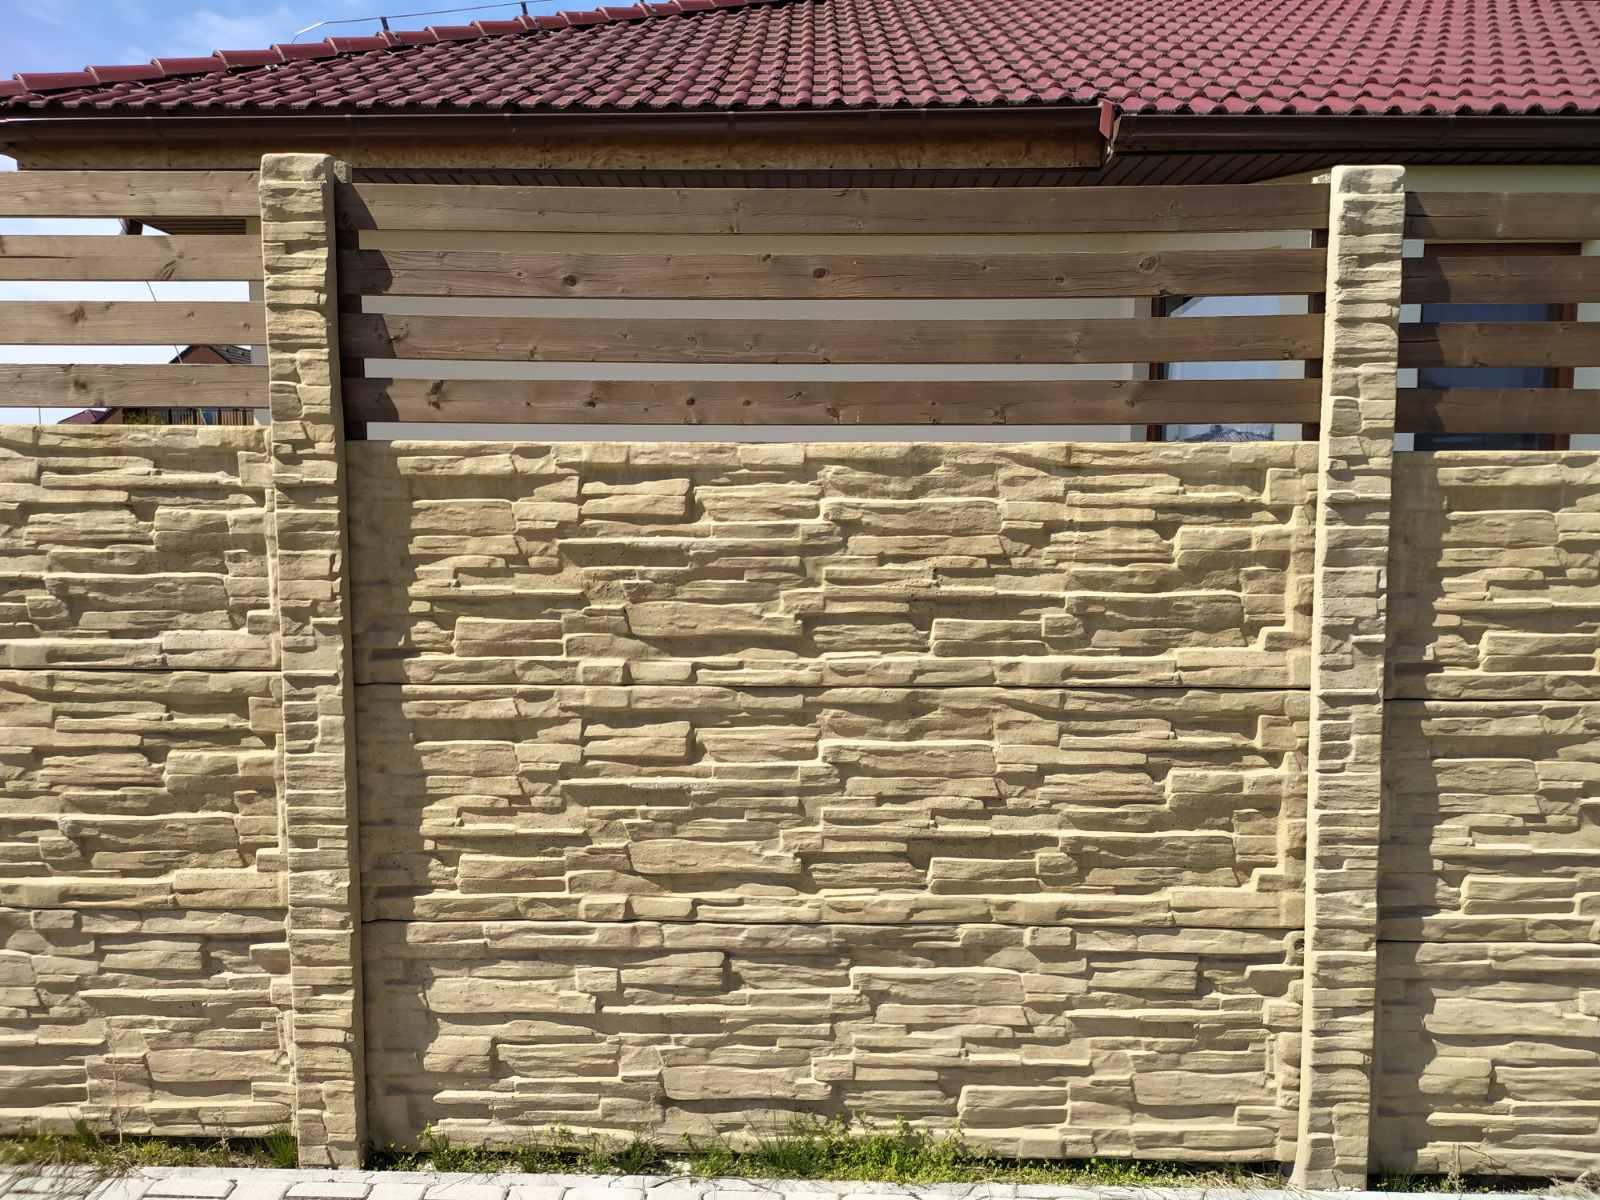 betonový plot s pískovou barvou a plotovkami